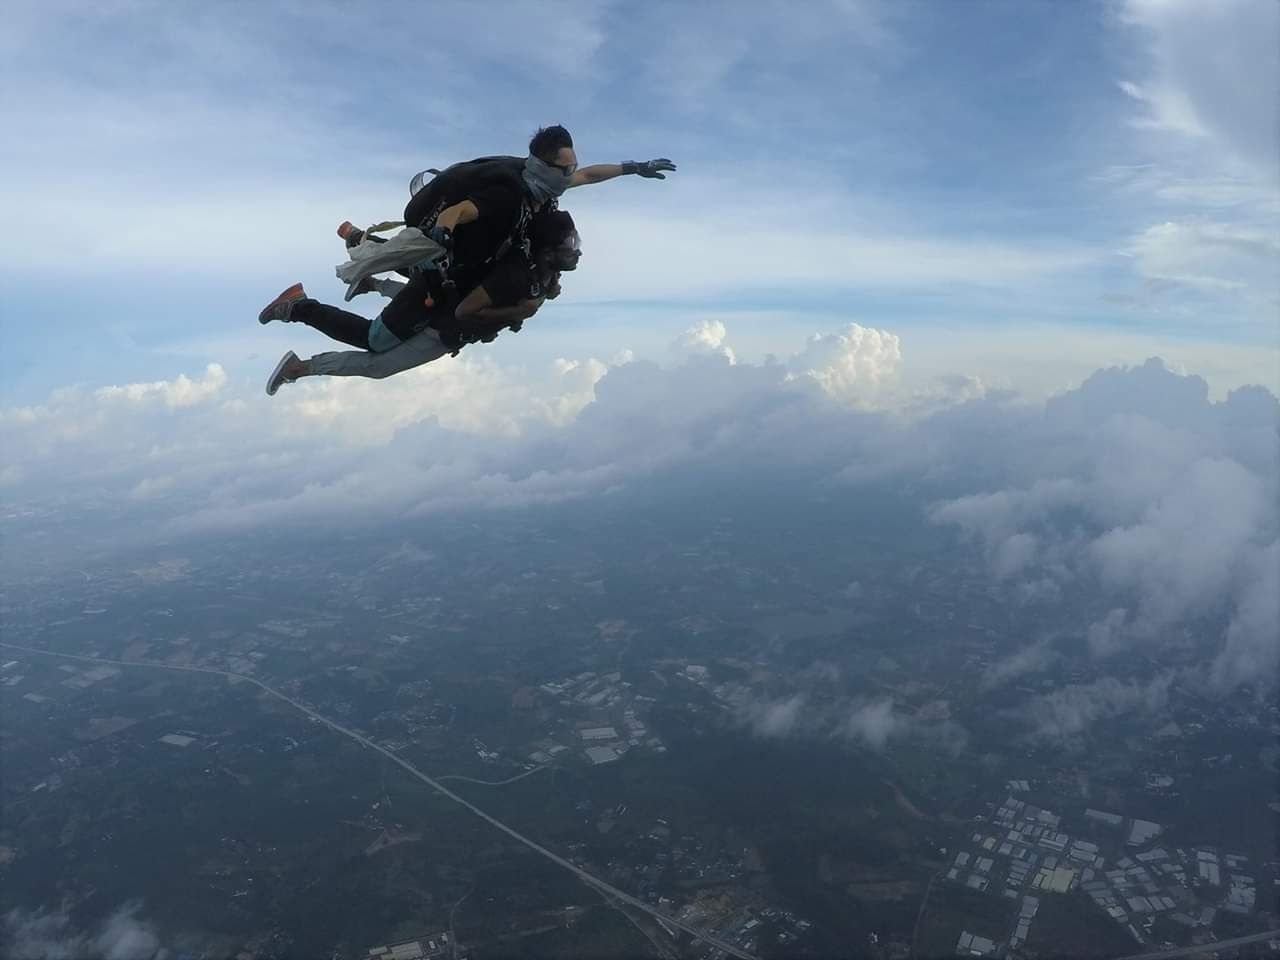 Photo of Thai Sky Adventures Co. By Suman Nutakki